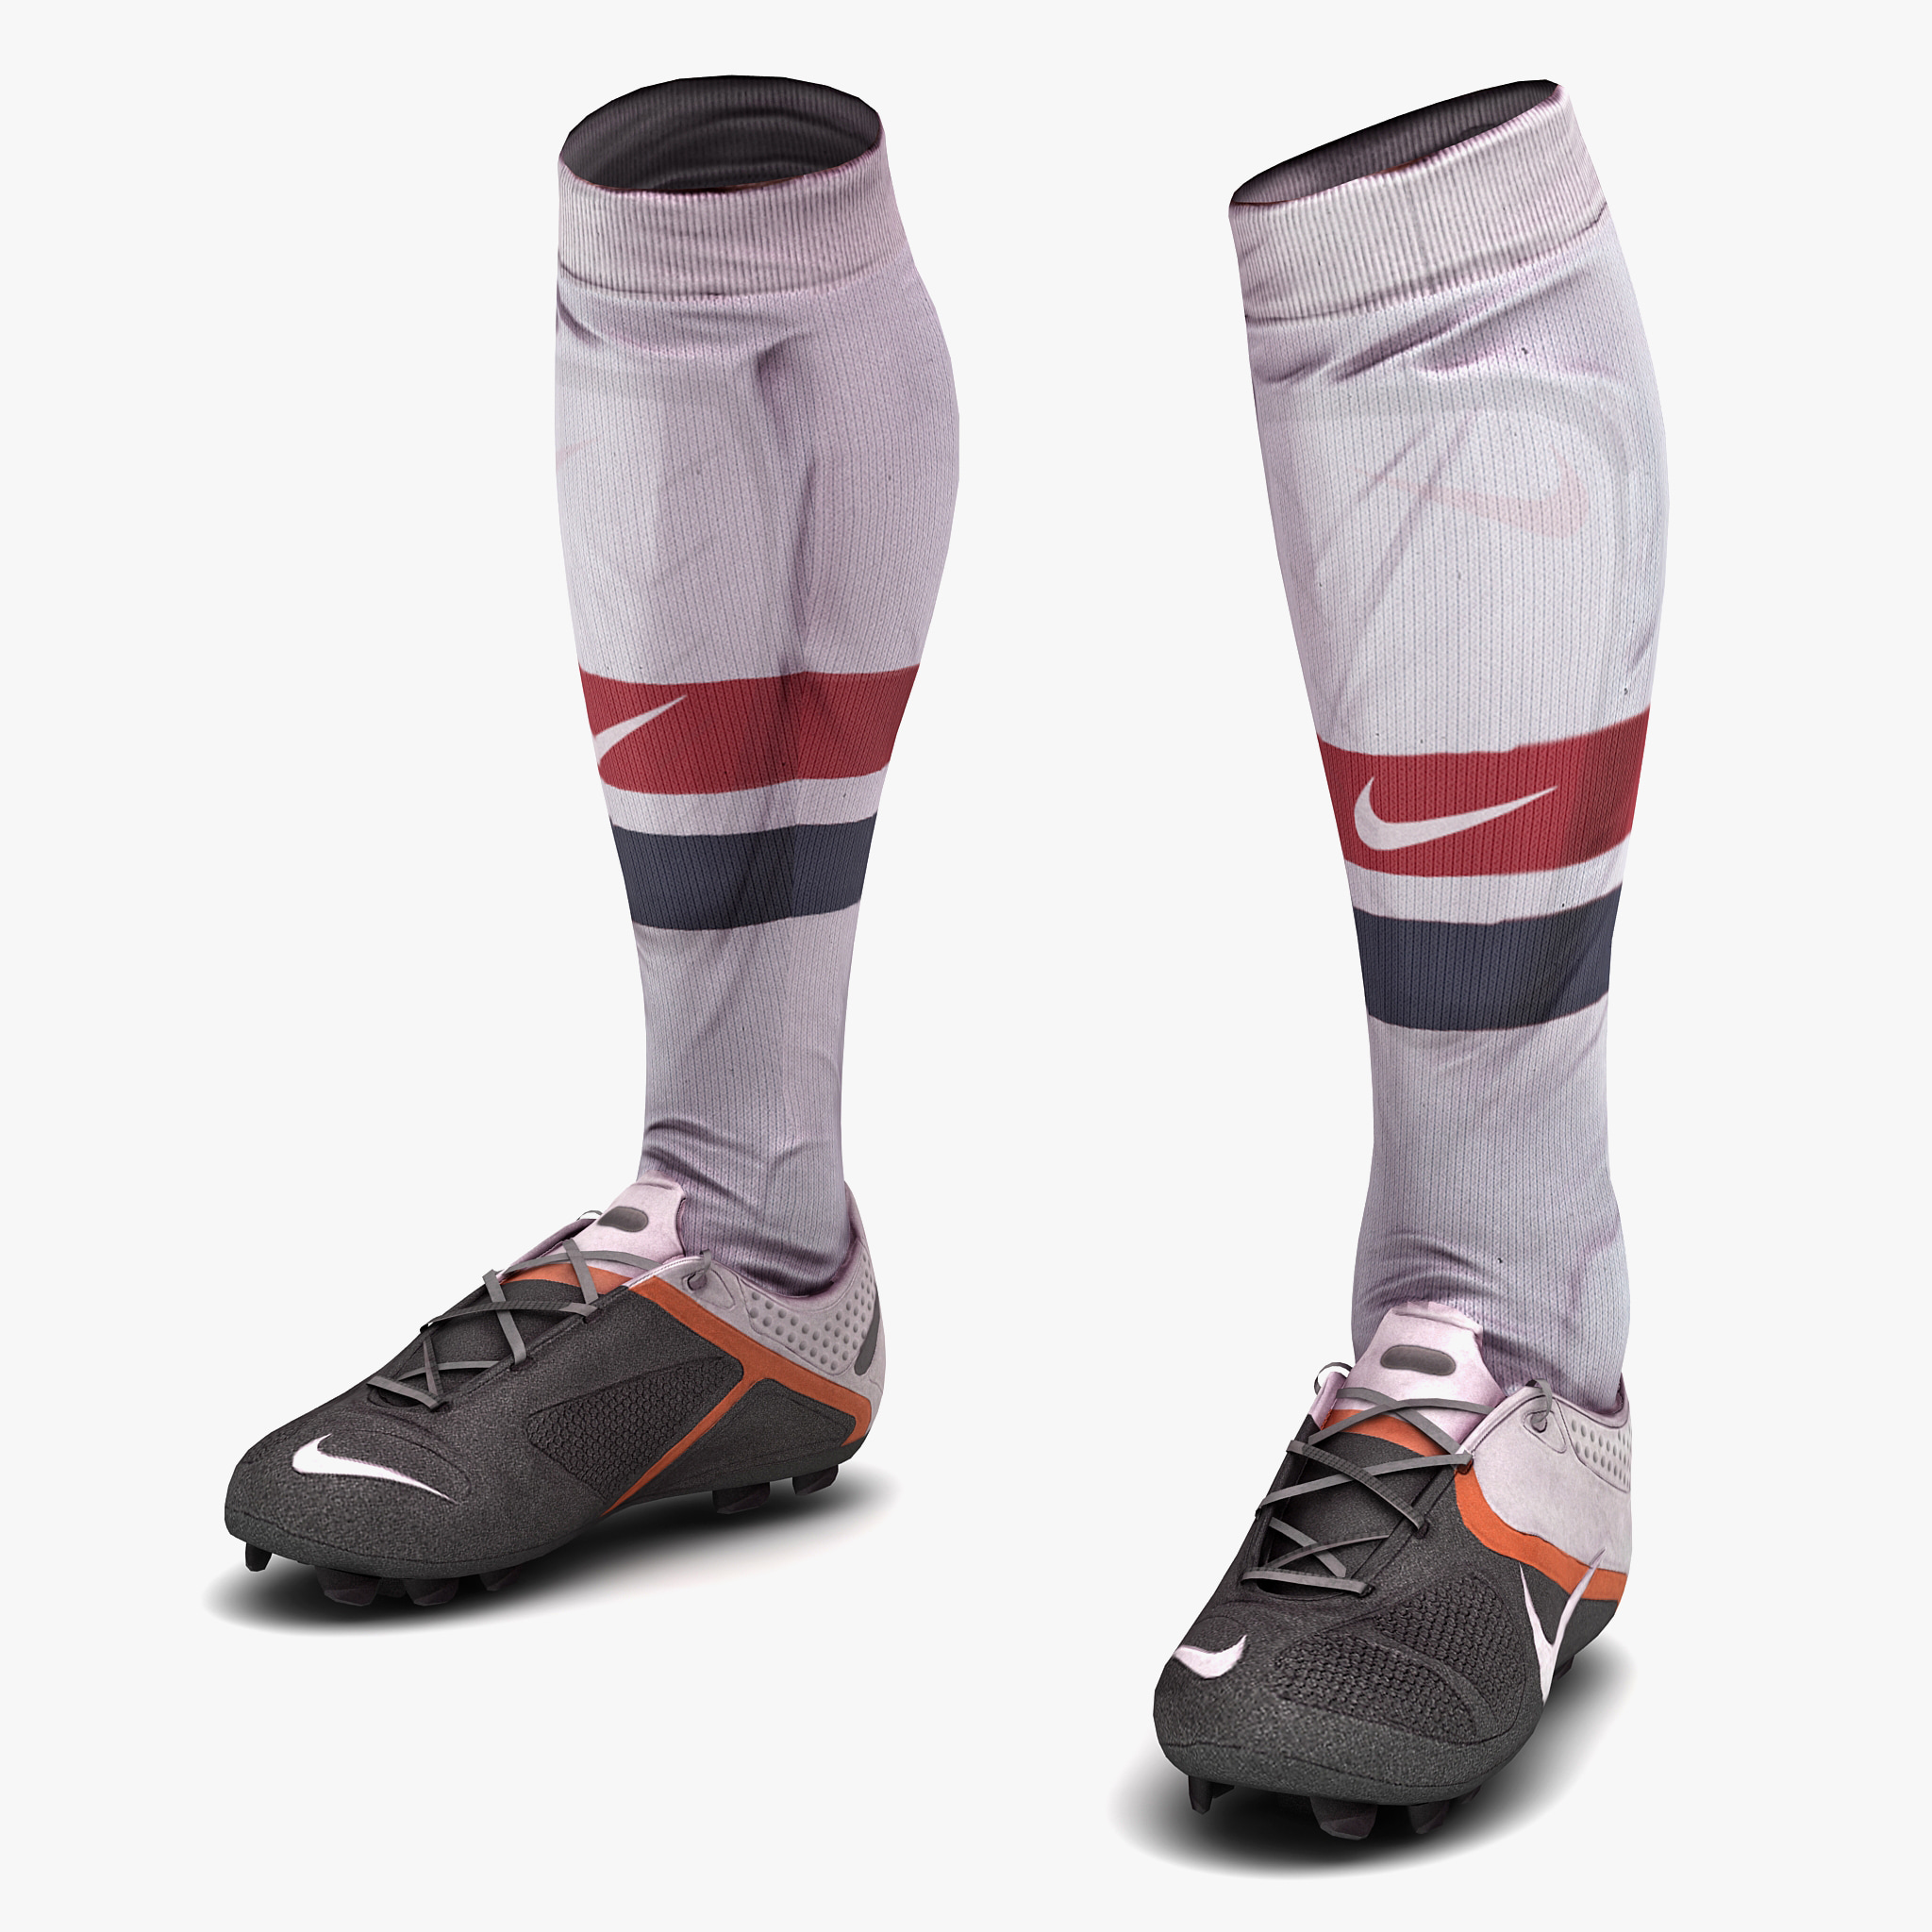 soccer boots 3 3d model